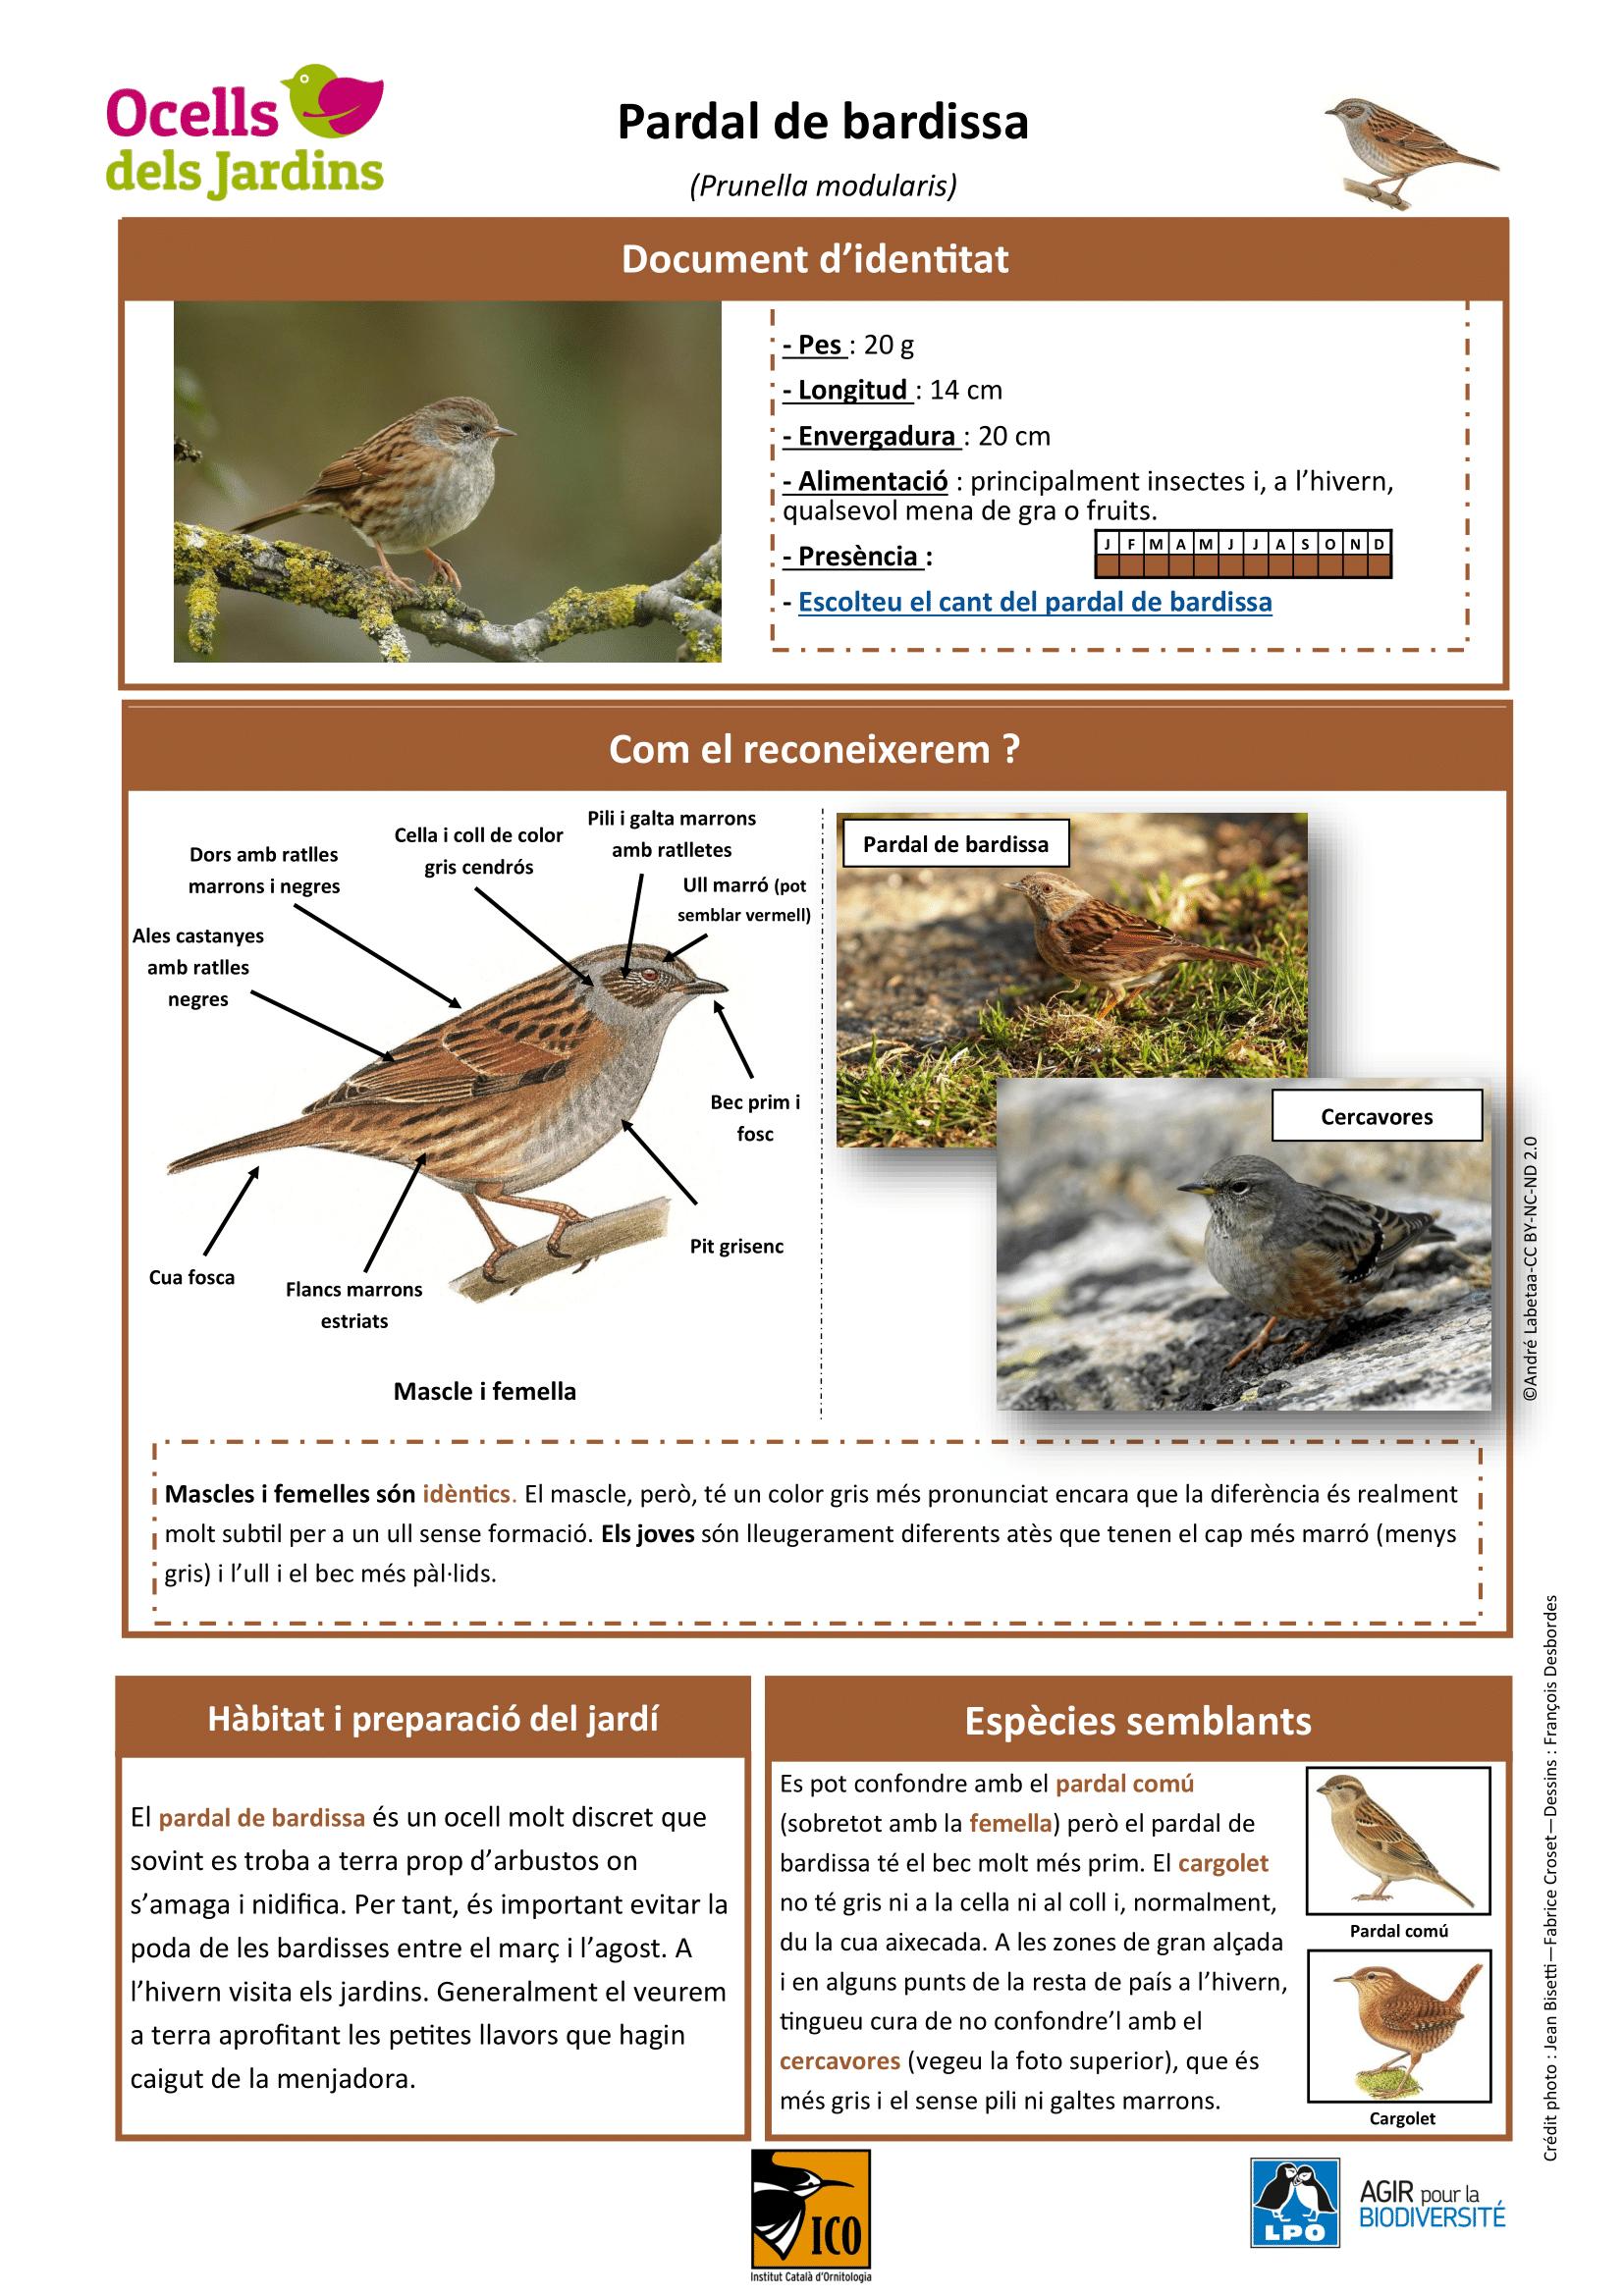 https://cdnfiles1.biolovision.net/www.ocellsdelsjardins.cat/userfiles/pardaldebardissa-1.png